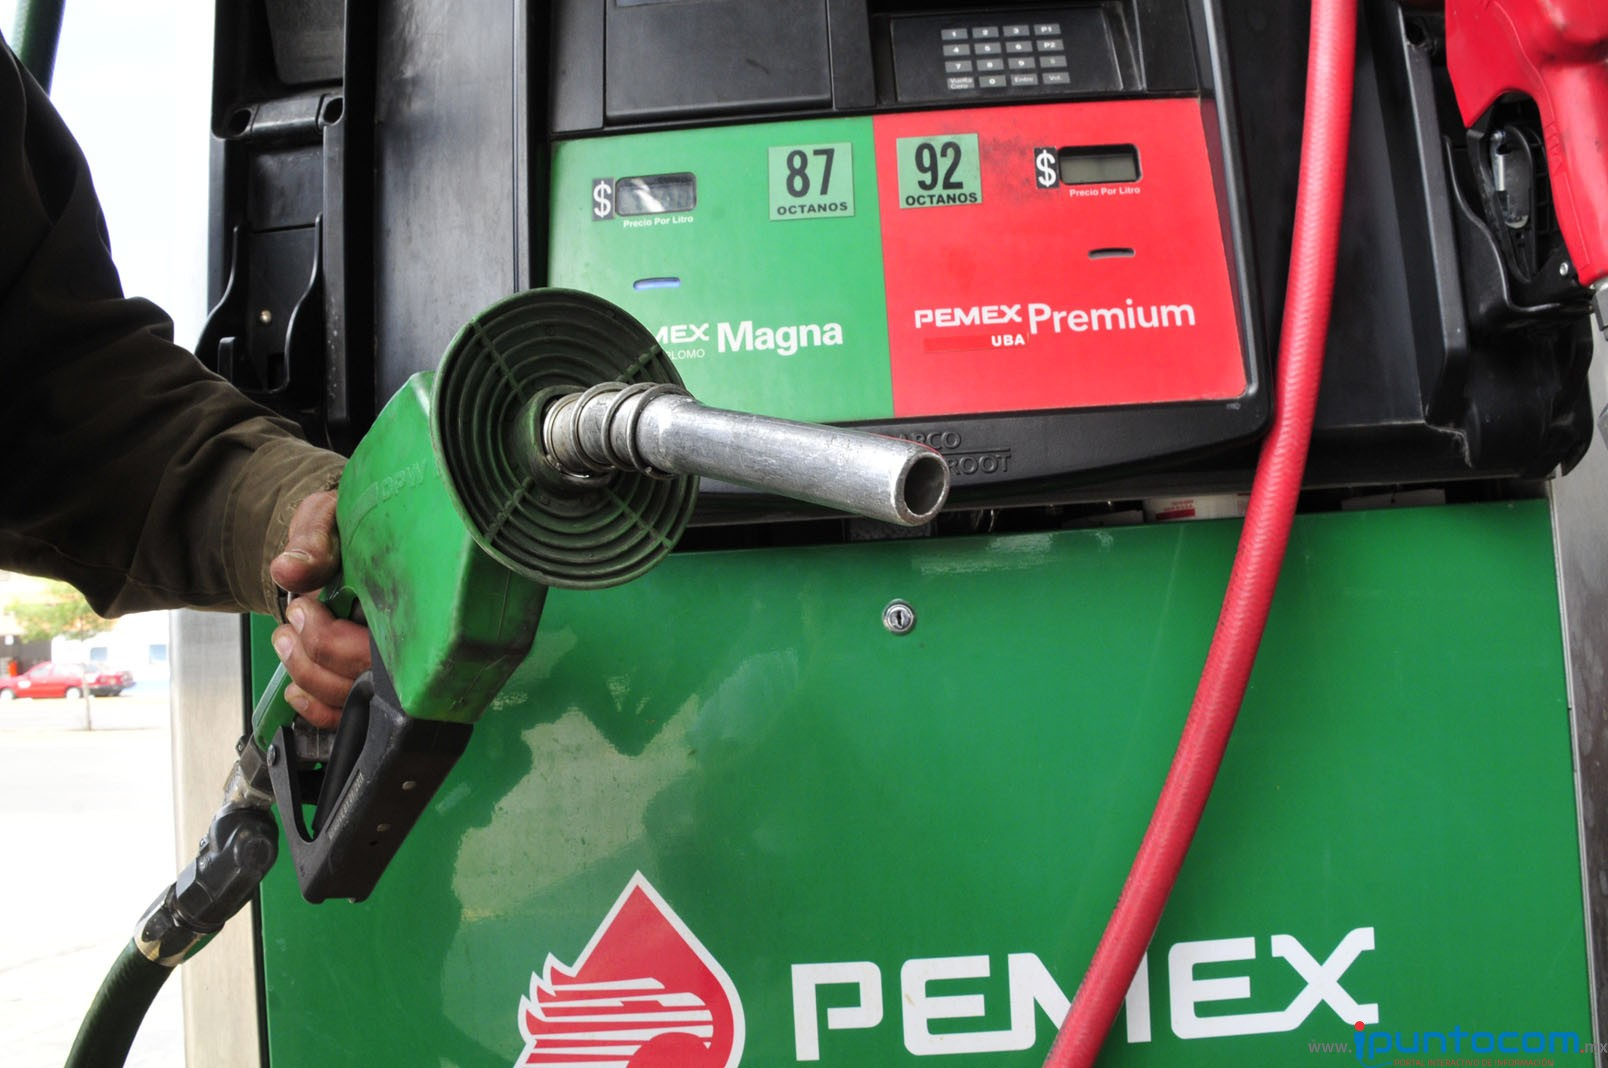 Las revocaciones mitsubisi padzhero 3 litros la gasolina